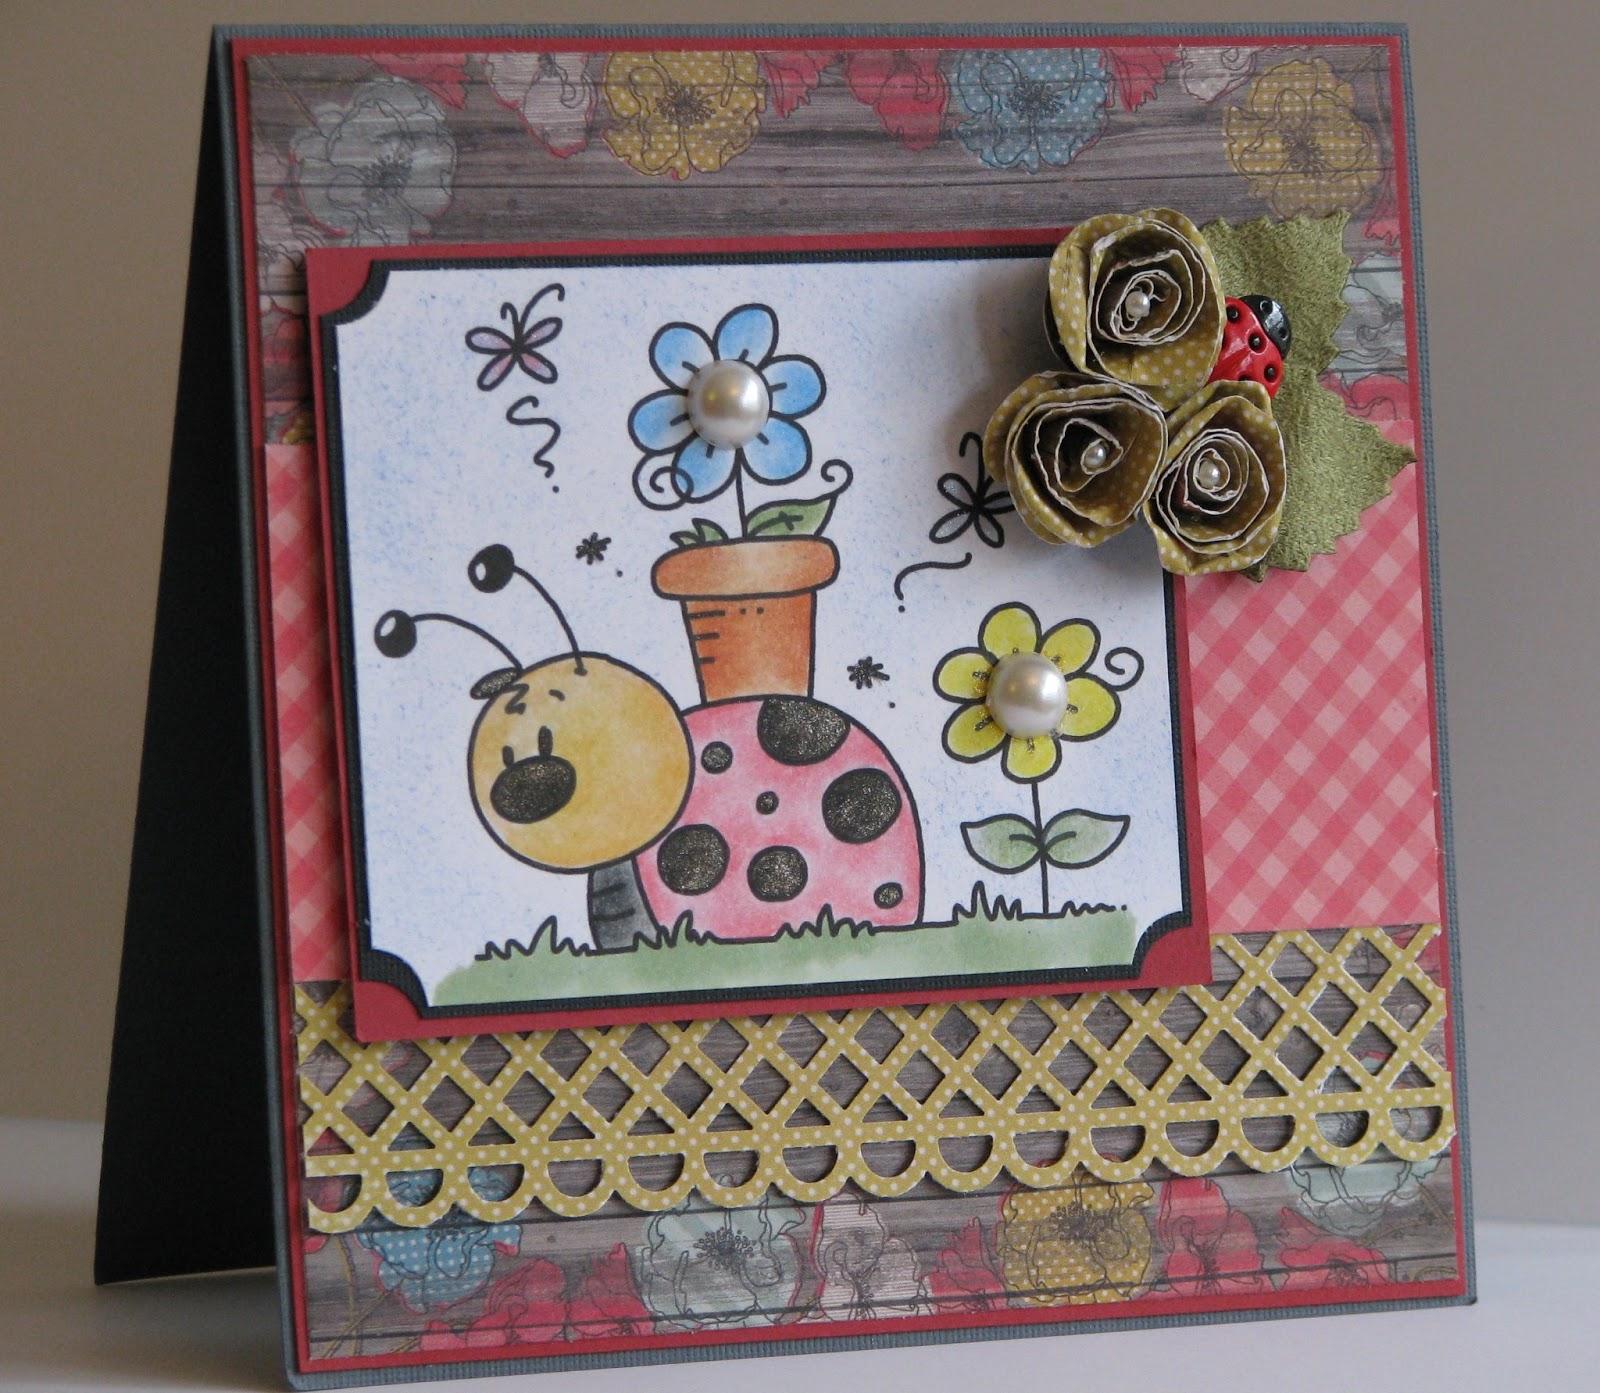 Ladybug Vky moreover Flat X F U further D E F C C A Ae Ca A F Fd moreover Tl moreover Flat X F. on spiral border punch